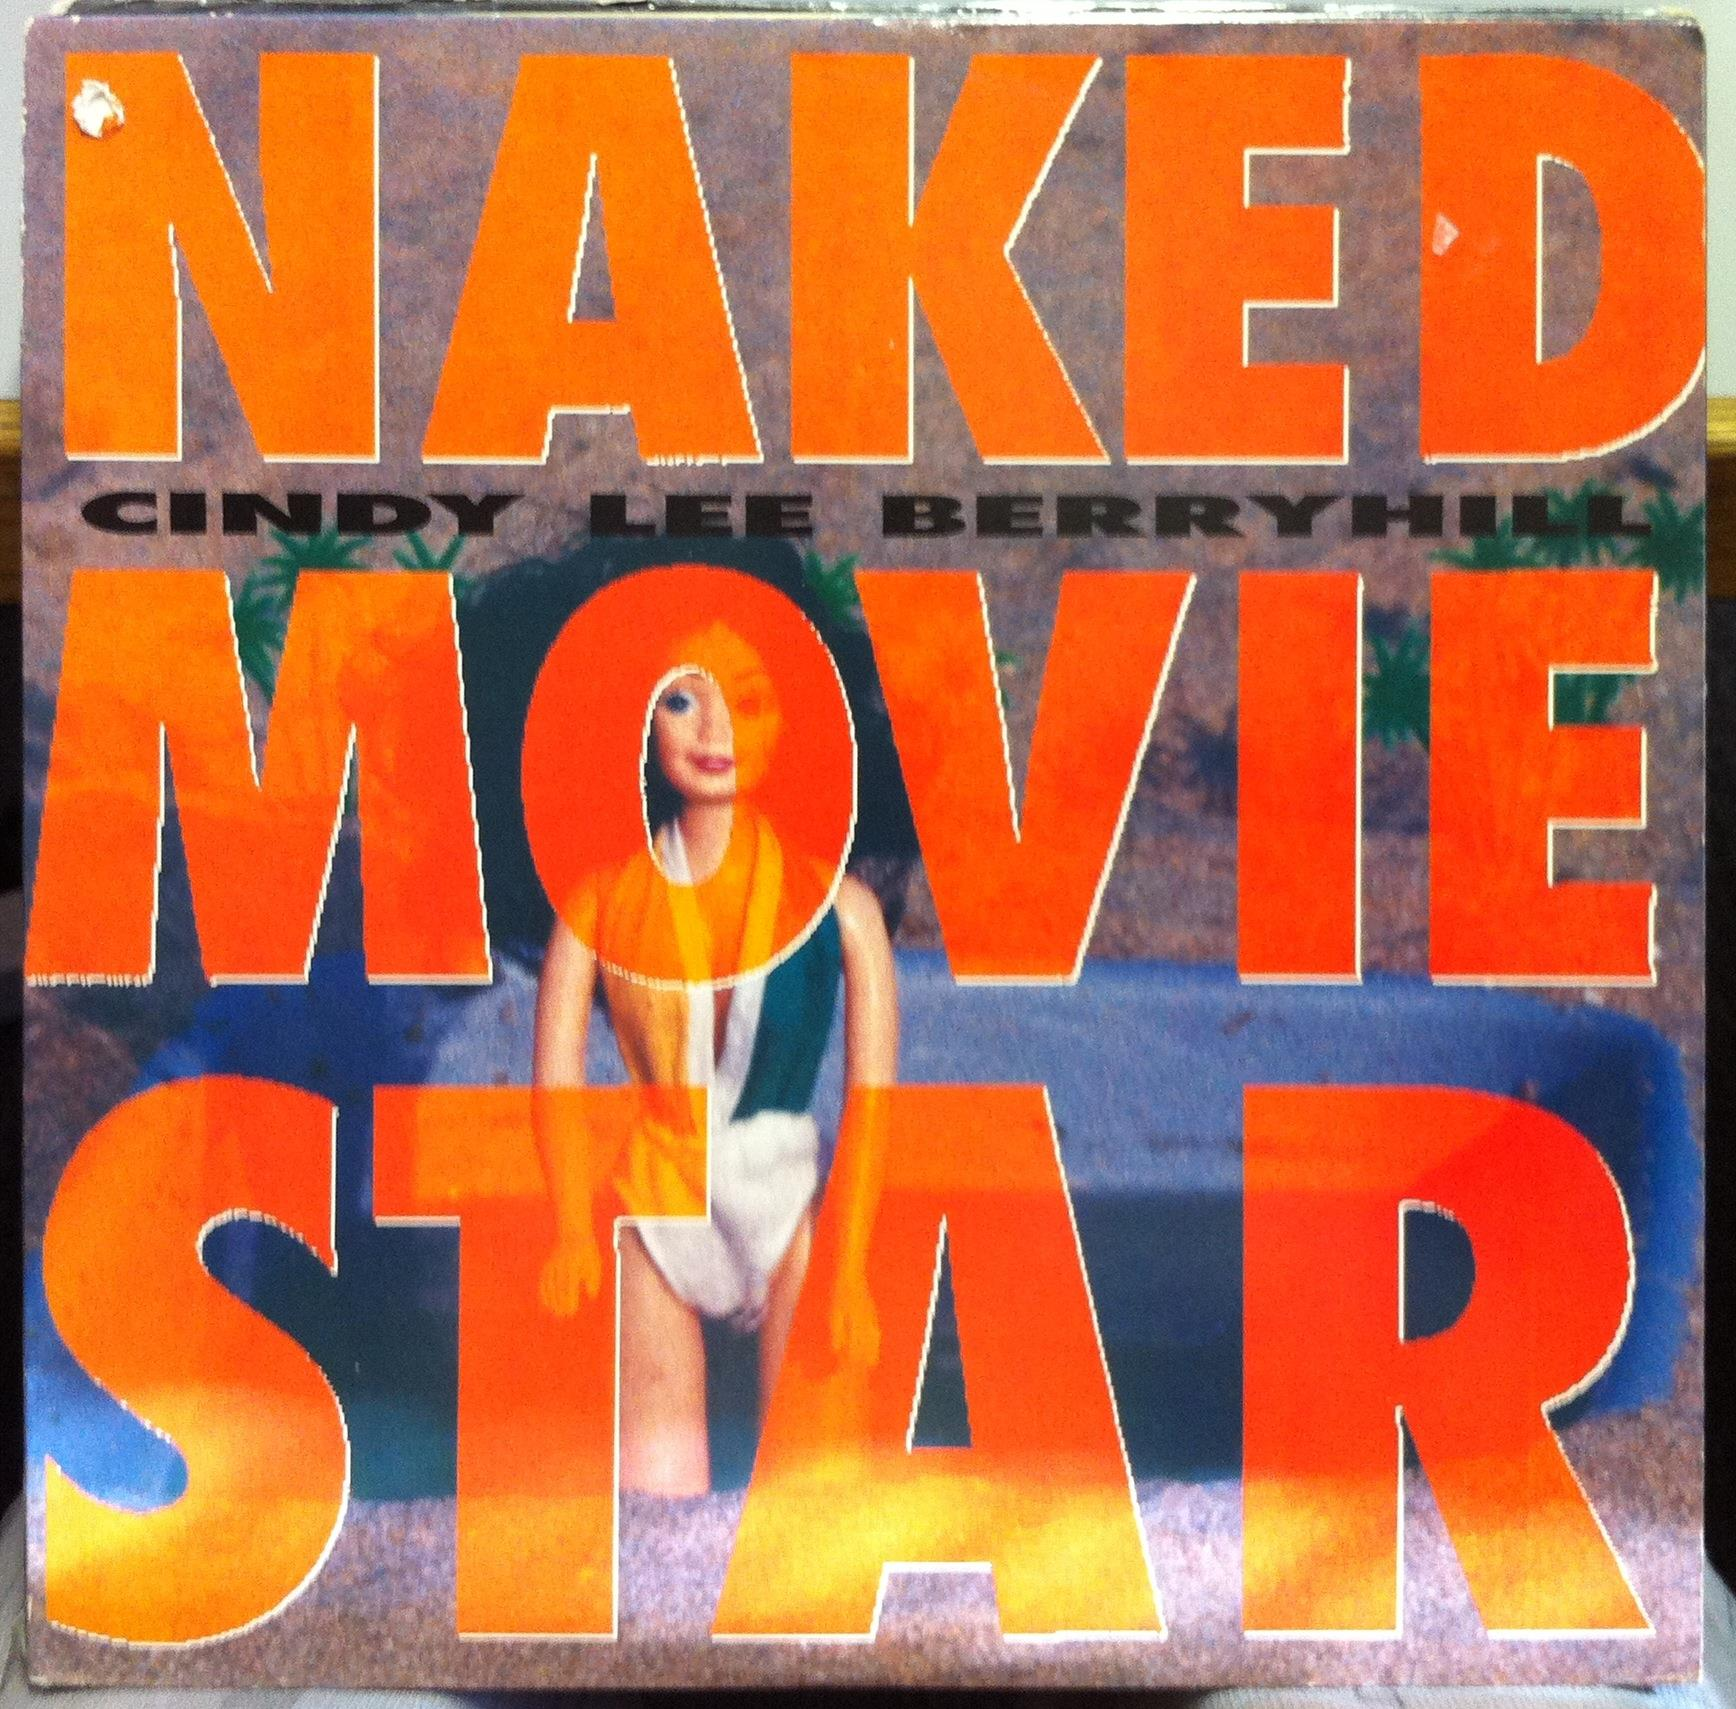 Cindy Lee Berryhill Naked Movie Star Lp Mint